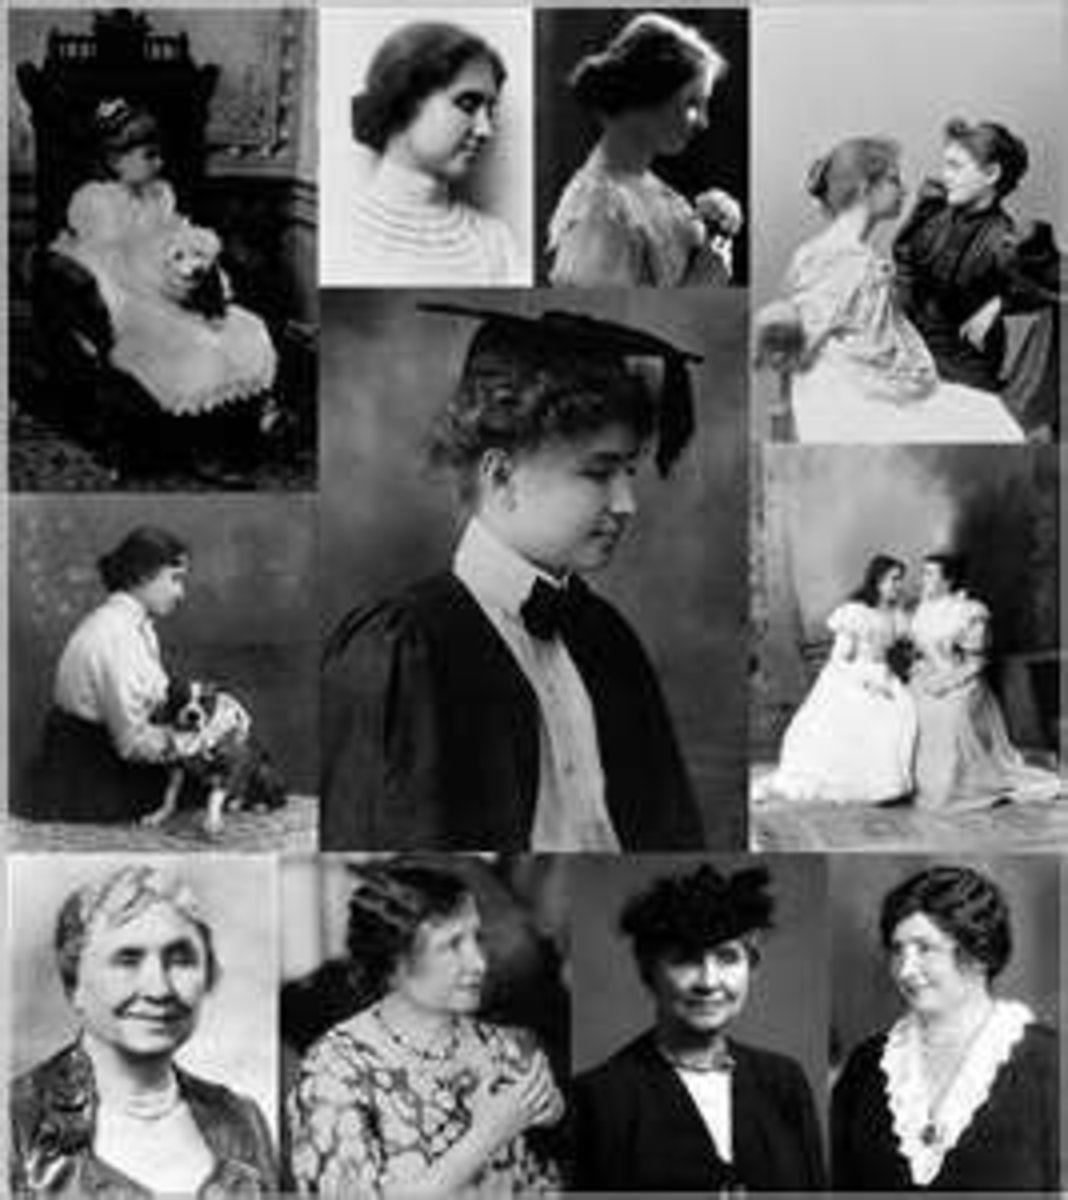 Image credit of Helen Keller: http://positivetosuccess.com/positive-stories/helen-keller-story-jun-27-1880-jun-1-1968/